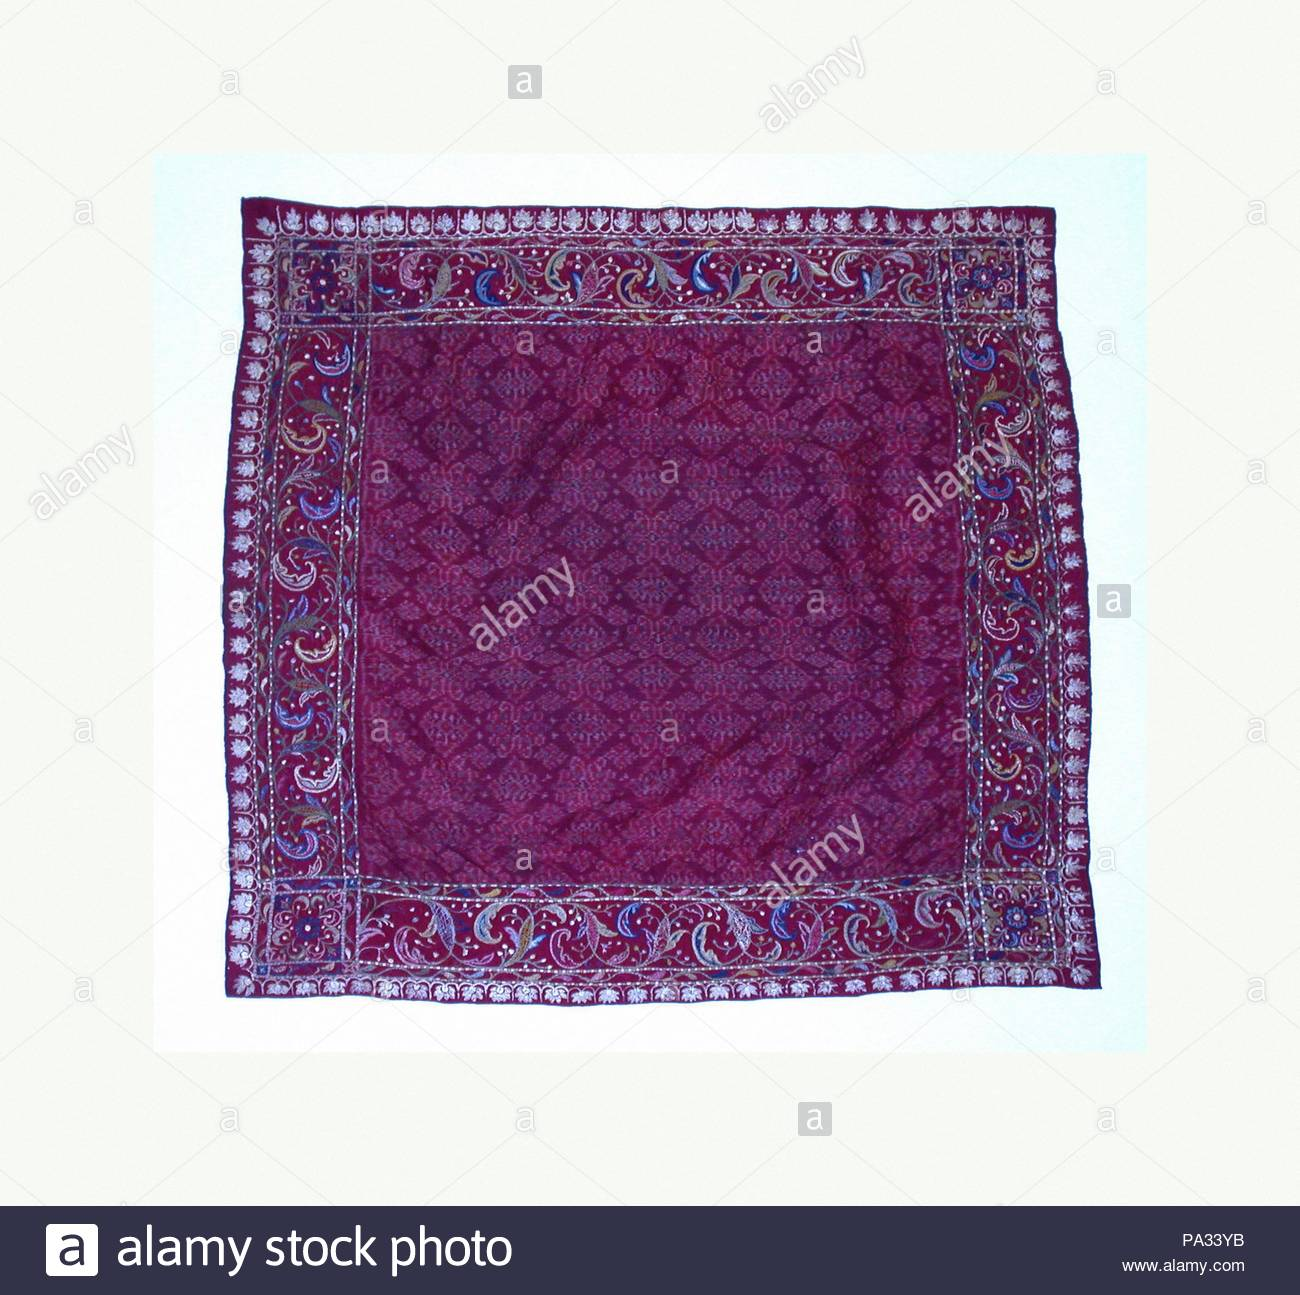 Headcloth, 18th–19th century, Indonesia, Sumatra, Palembang, Palembang, Silk, H x W: 34 1/4 x 34 1/4 in. (87 x 87 cm), Textiles-Woven. - Stock Image